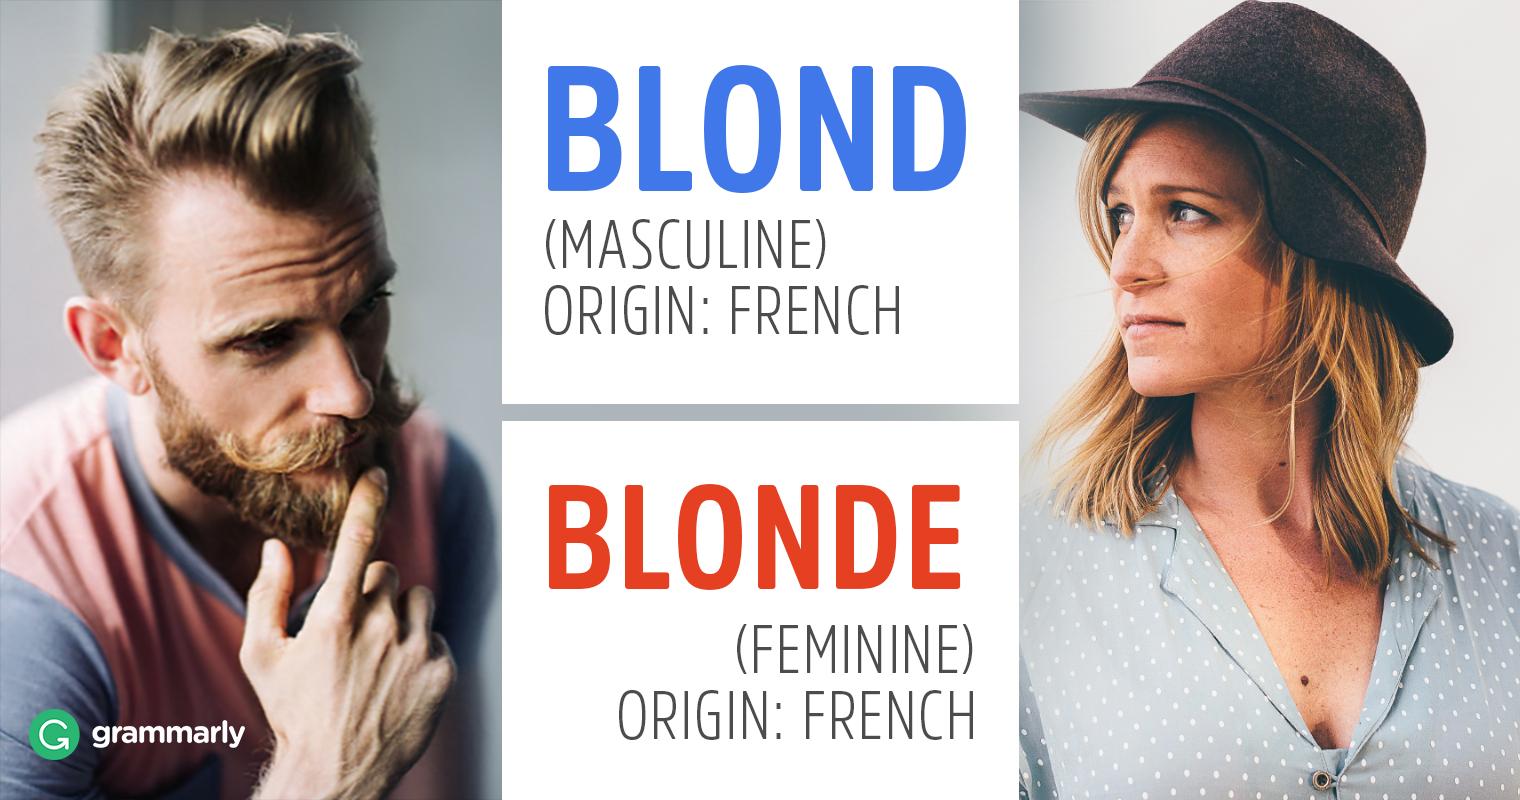 Blond or Blonde image